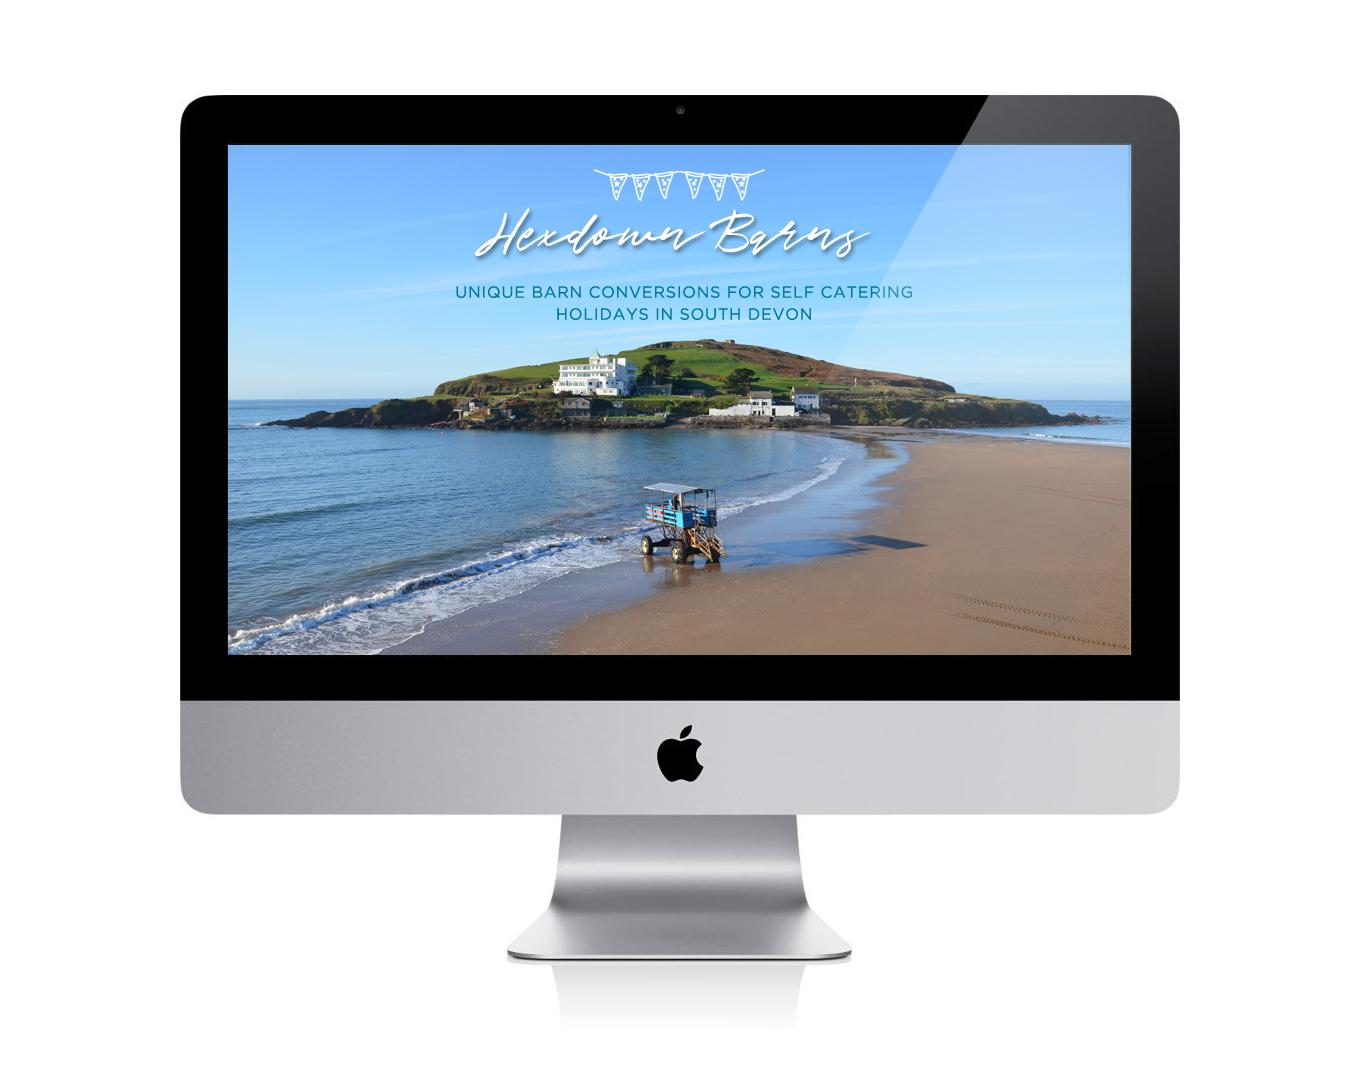 Hexdown Barns holidays web imac